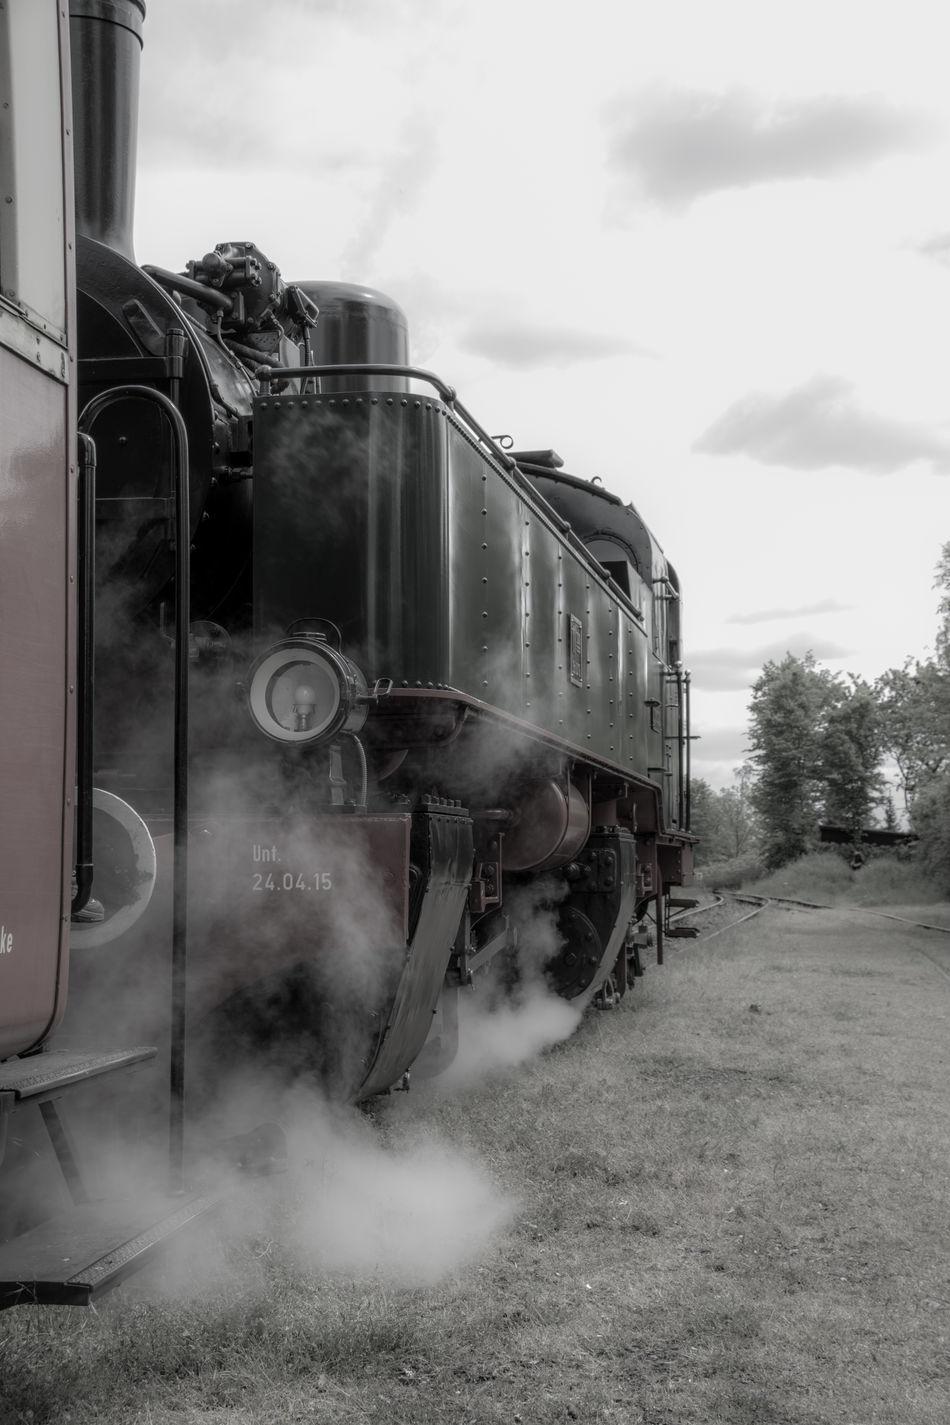 Vulkan-Express Brohltalbahn Dampflok Historic Train Land Vehicle Oldtimer Steam Locomotive Steam Trains Vulkanexpress